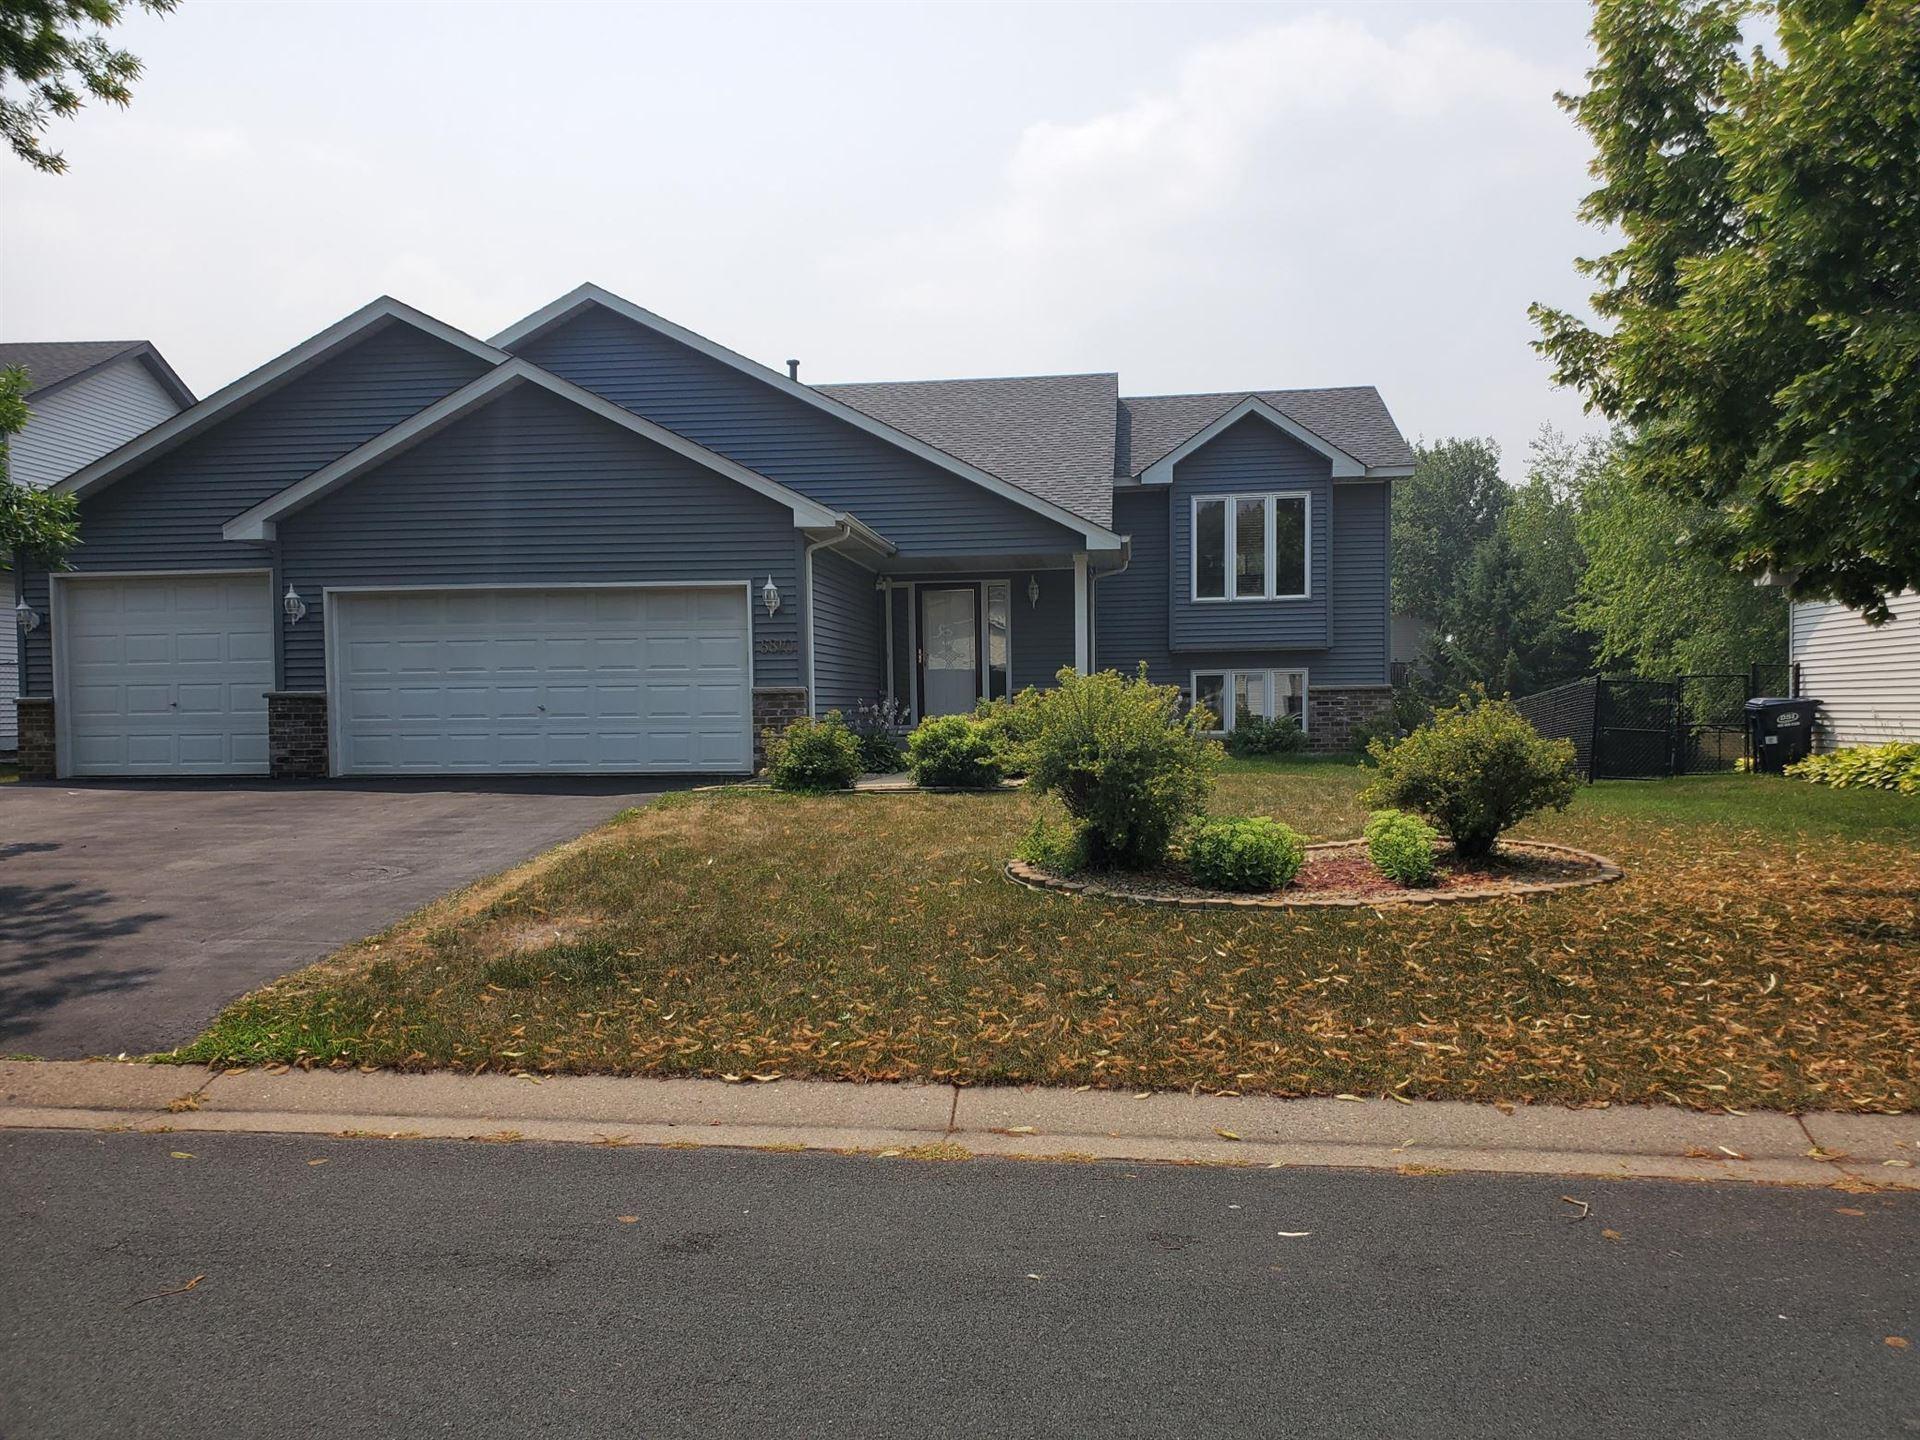 Photo of 5810 184th St West, Farmington, MN 55024 (MLS # 6074584)